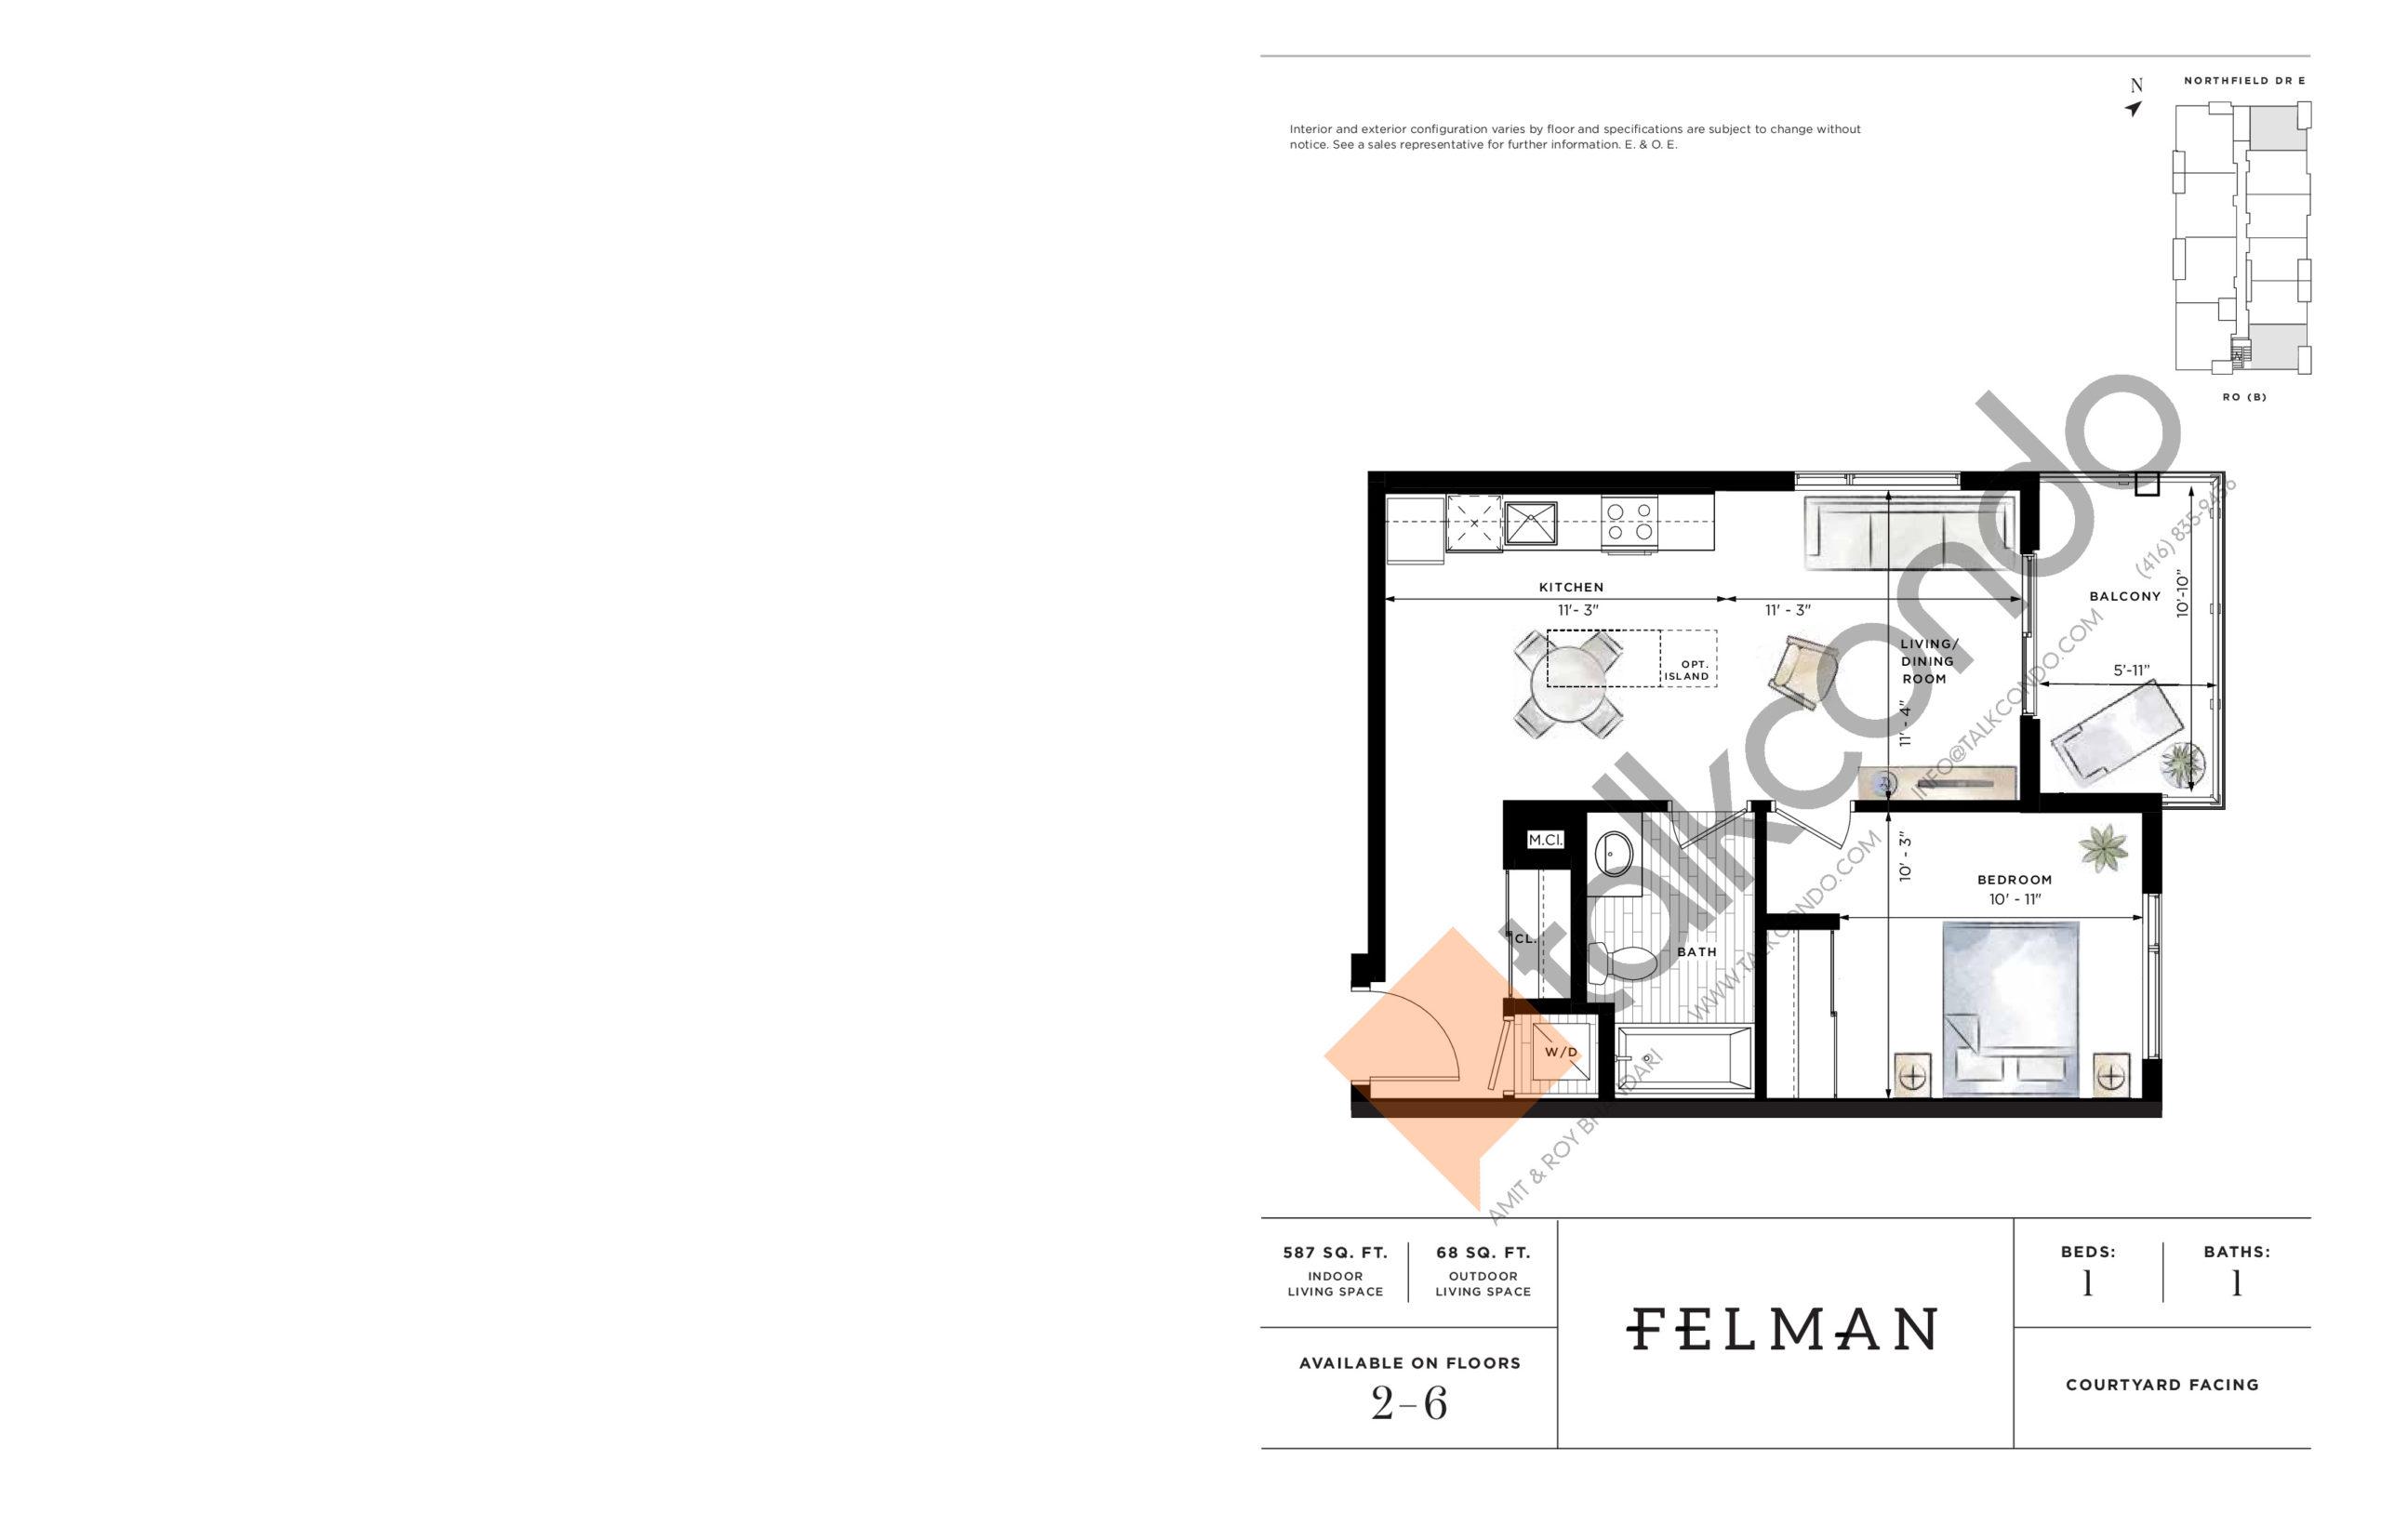 Felman Floor Plan at Ro at Blackstone Condos - 587 sq.ft